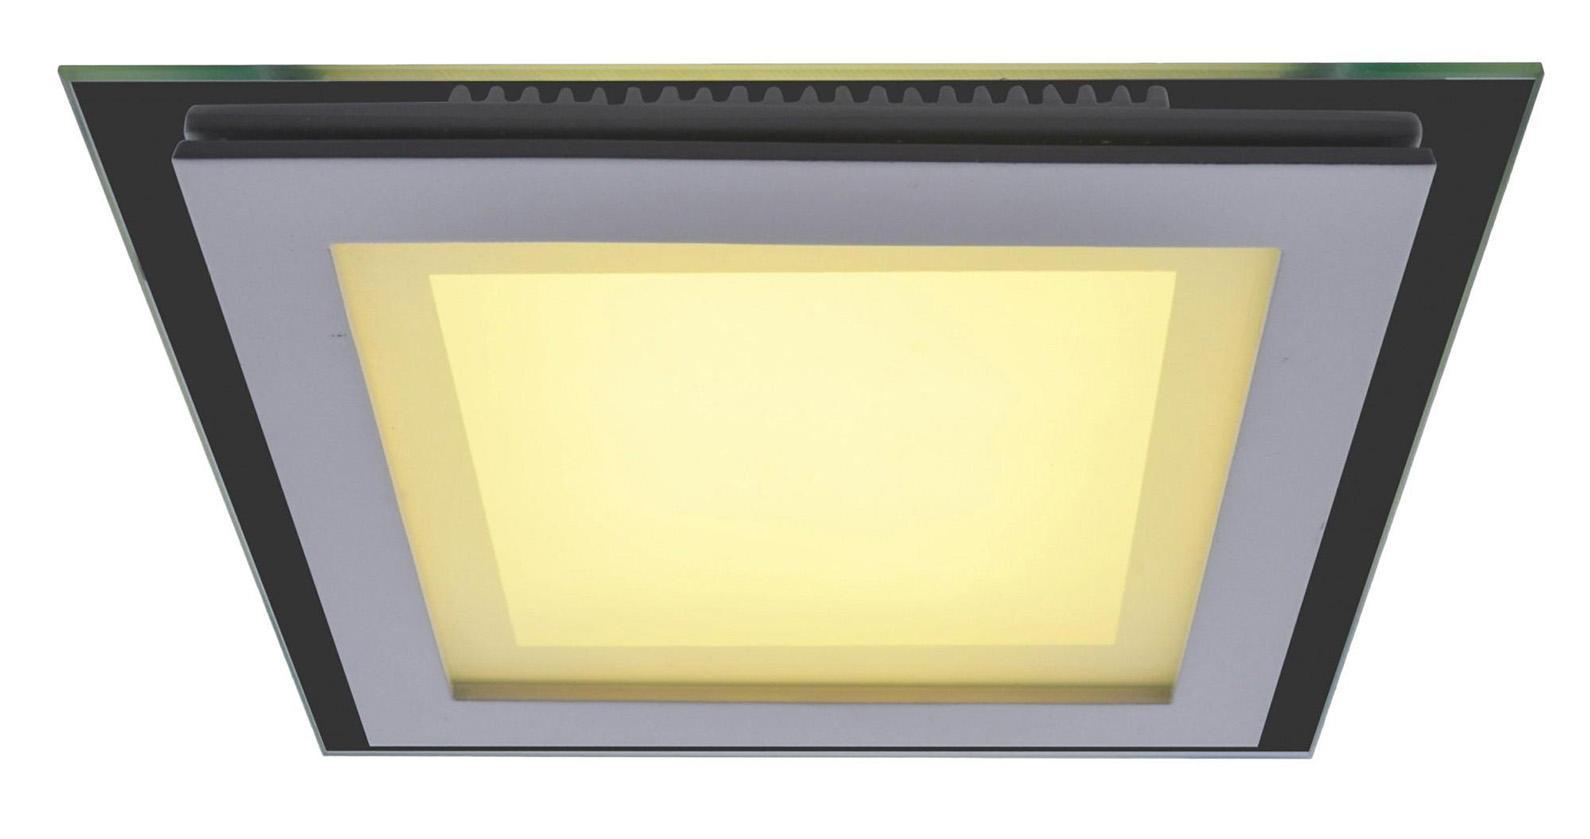 A4012PL-1WH RAGGIO Встраиваемый светильникA4012PL-1WH12W LED; 960 lm